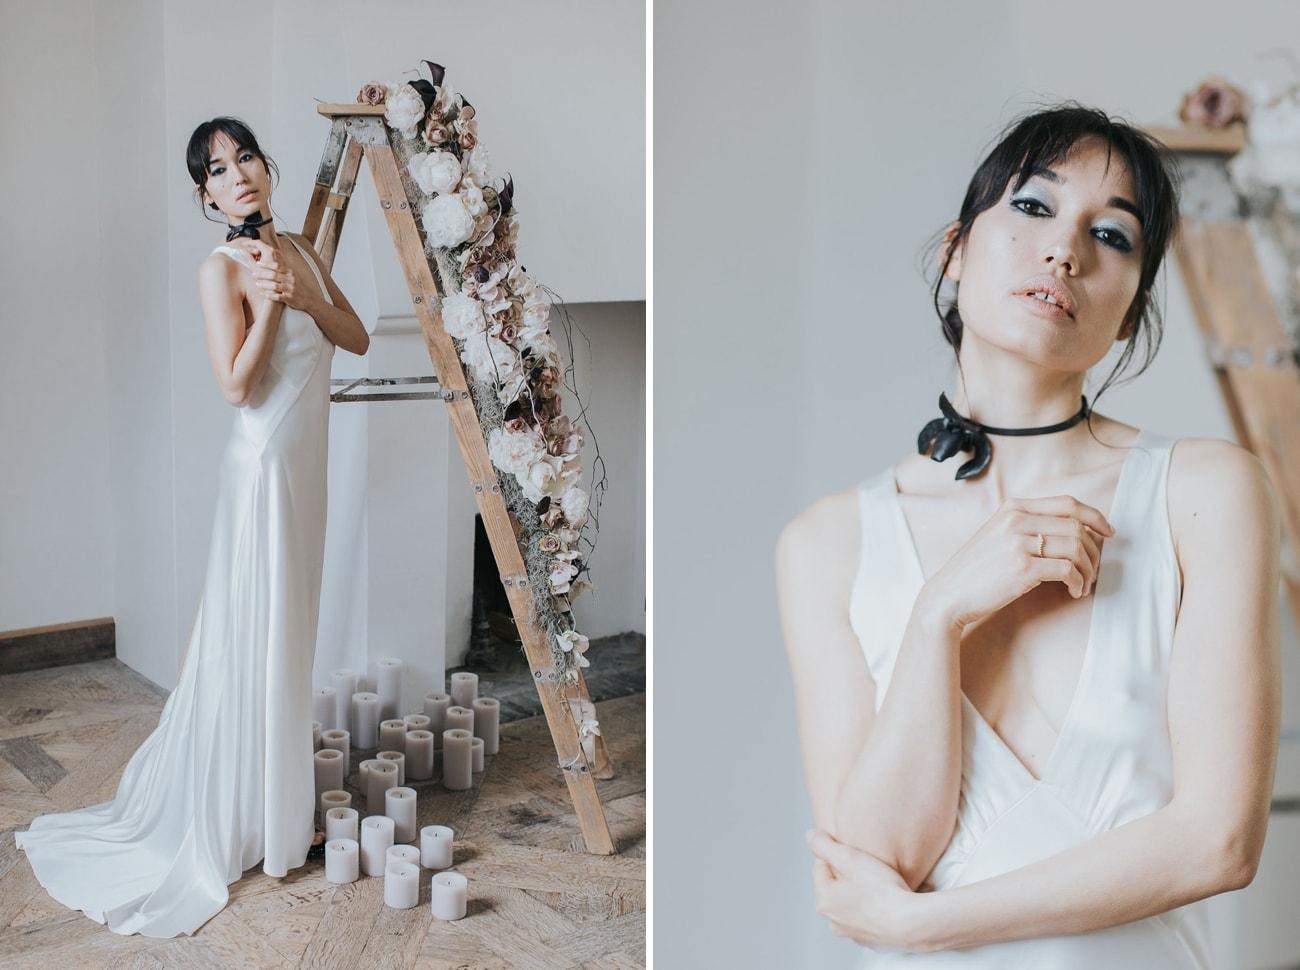 Silver Bridal Make Up | Credit: Cornelia Lietz